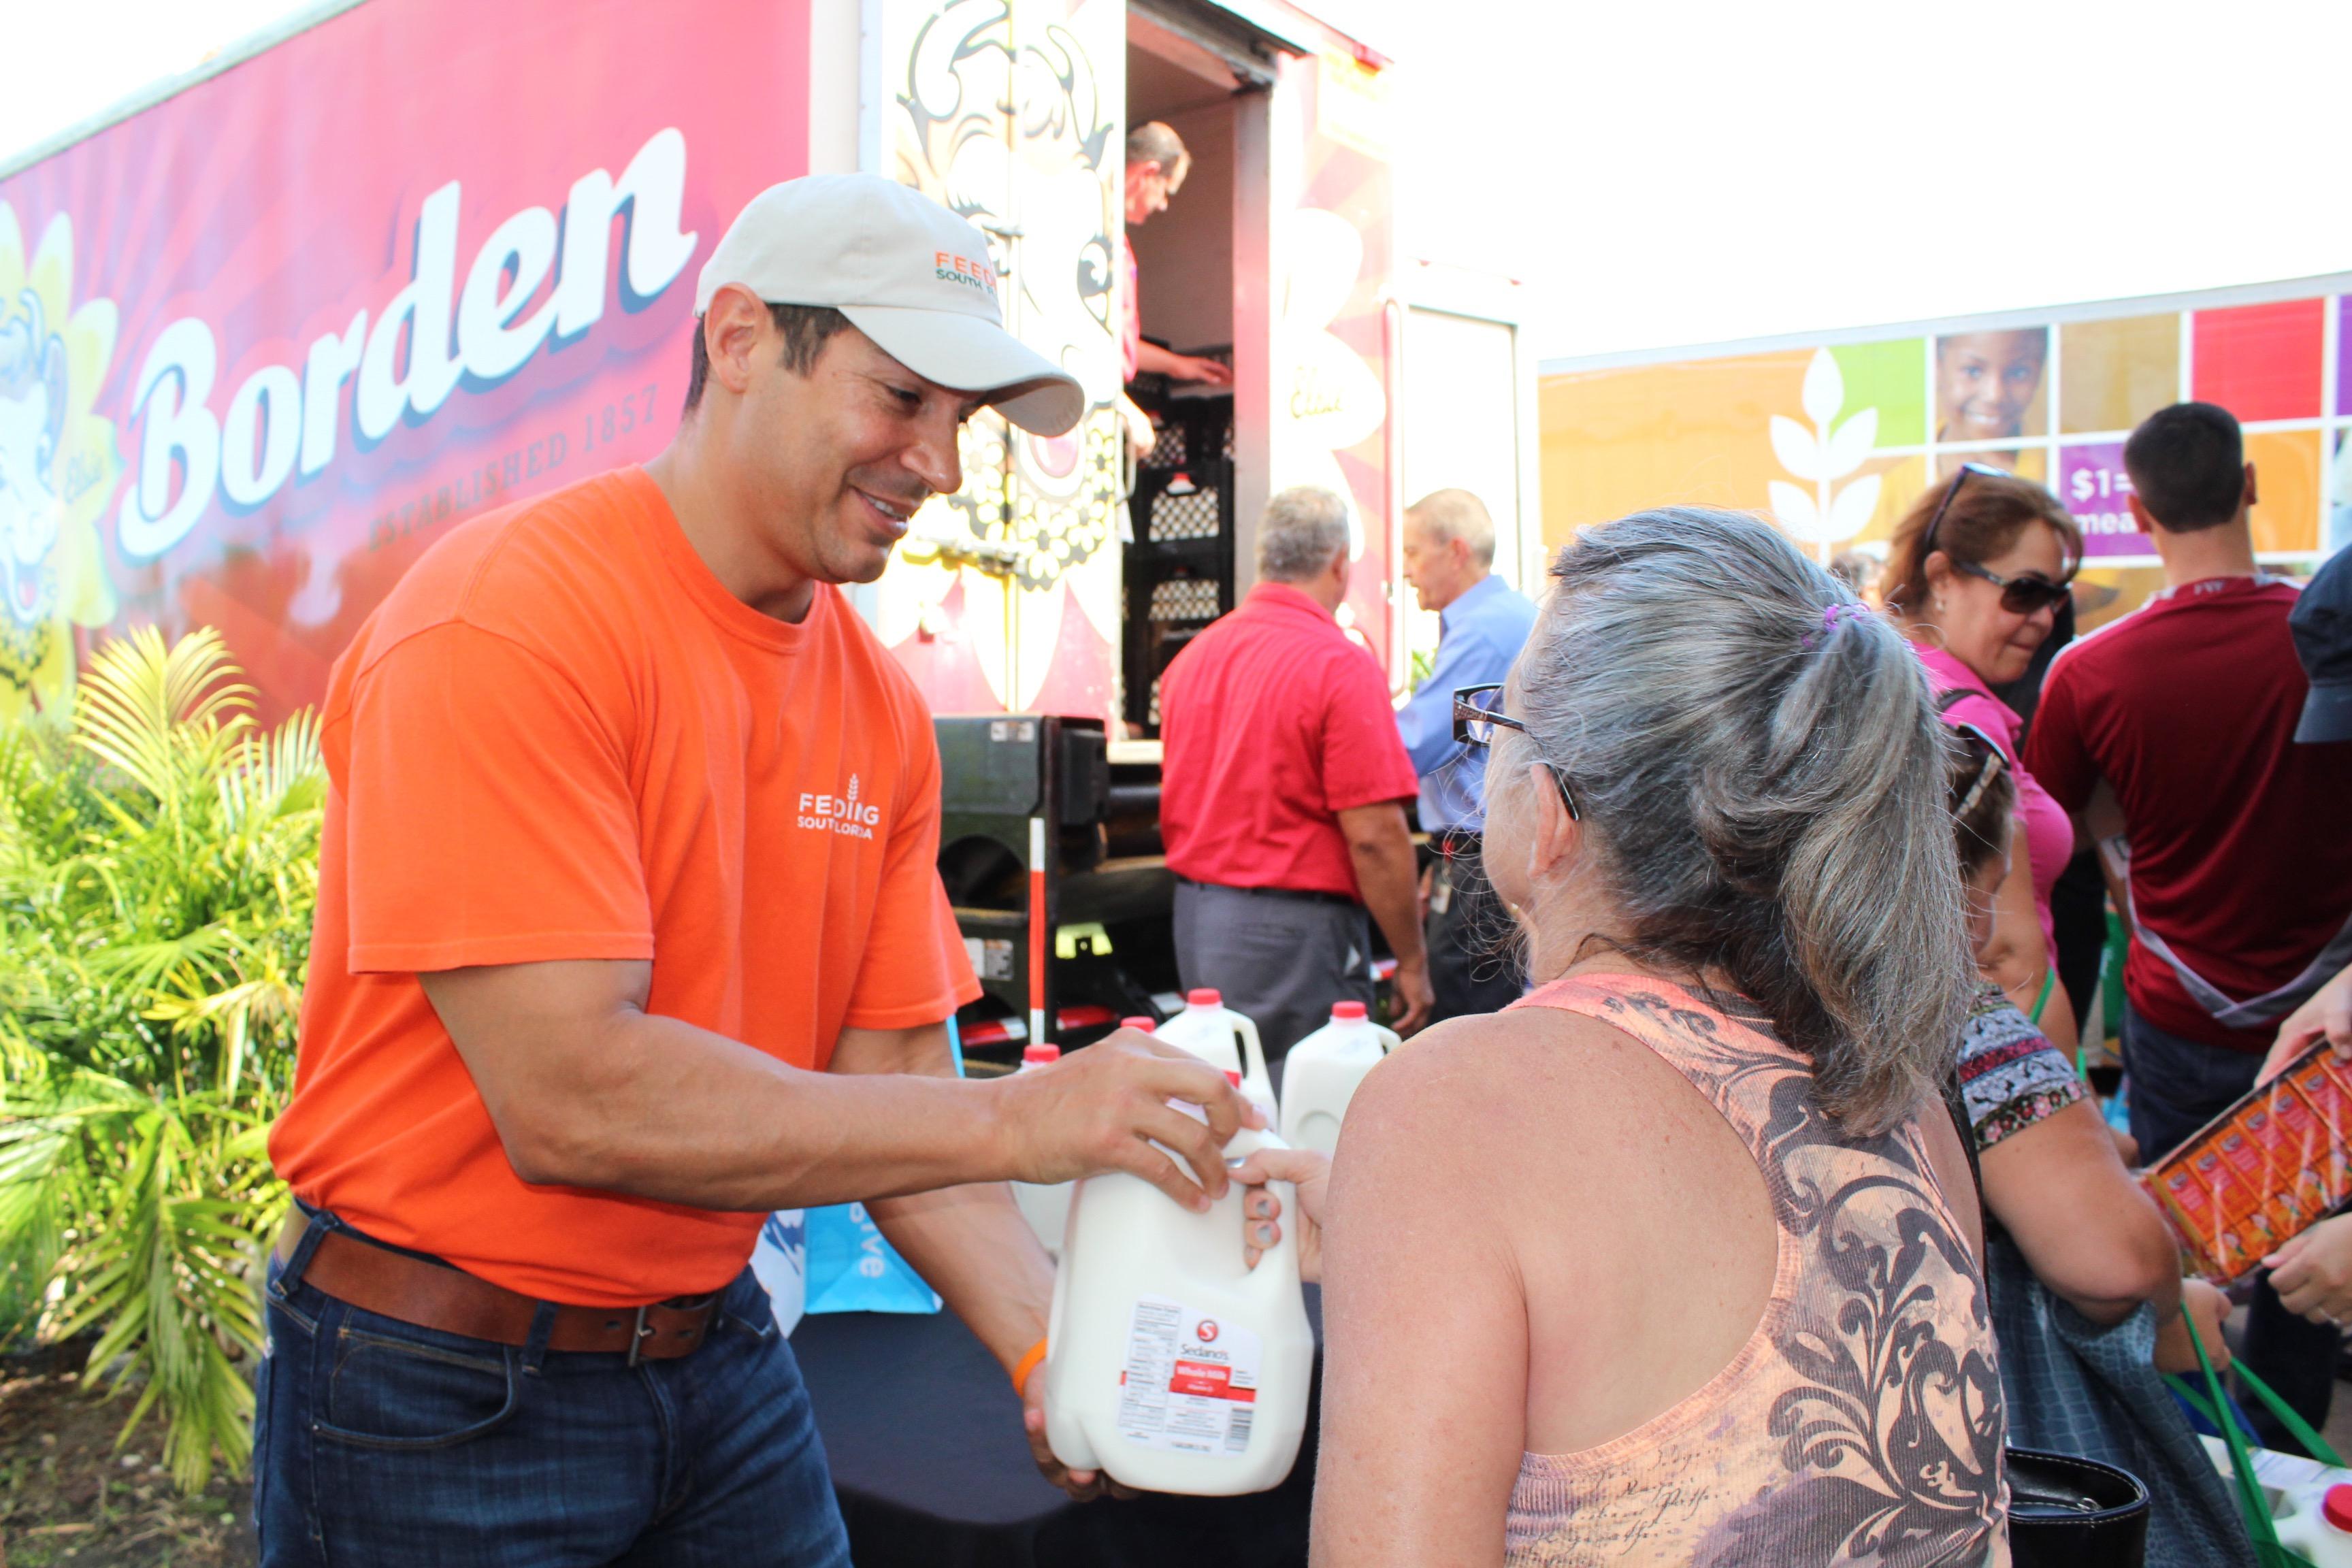 Feeding South Florida receives 6,000 gallons of milk